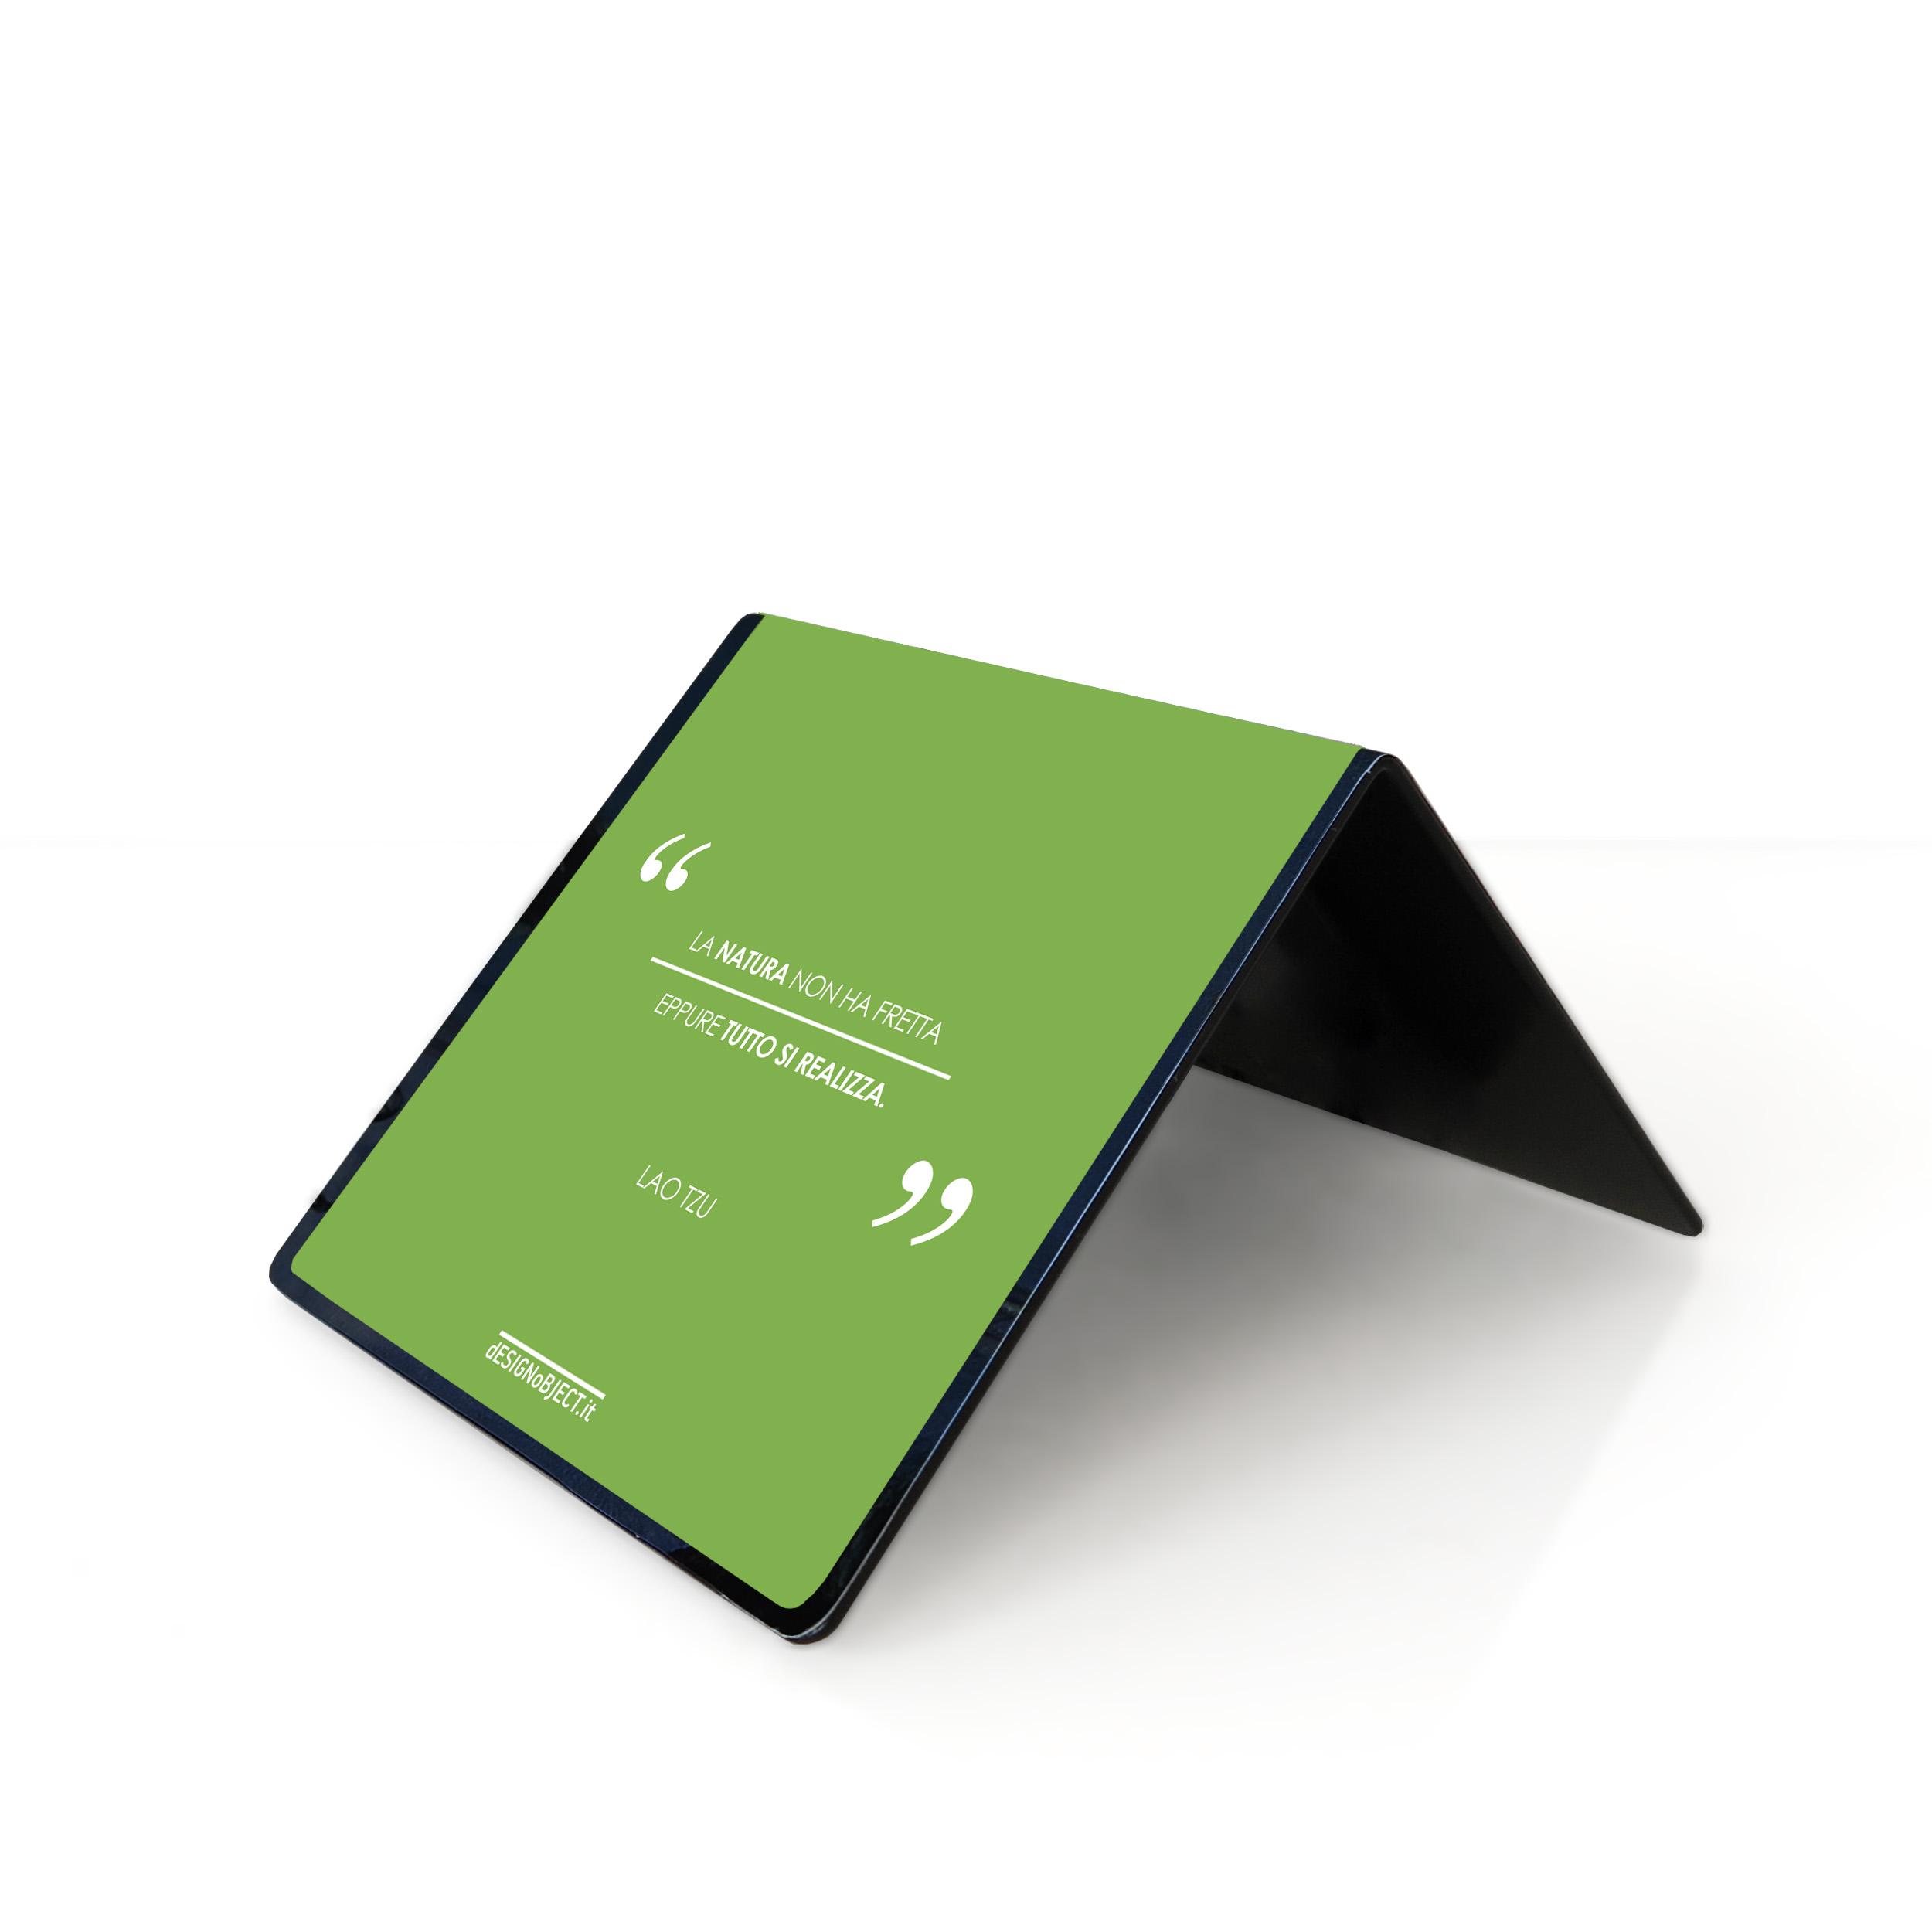 orologio di design table clock minimal design citazioni frasi Natura